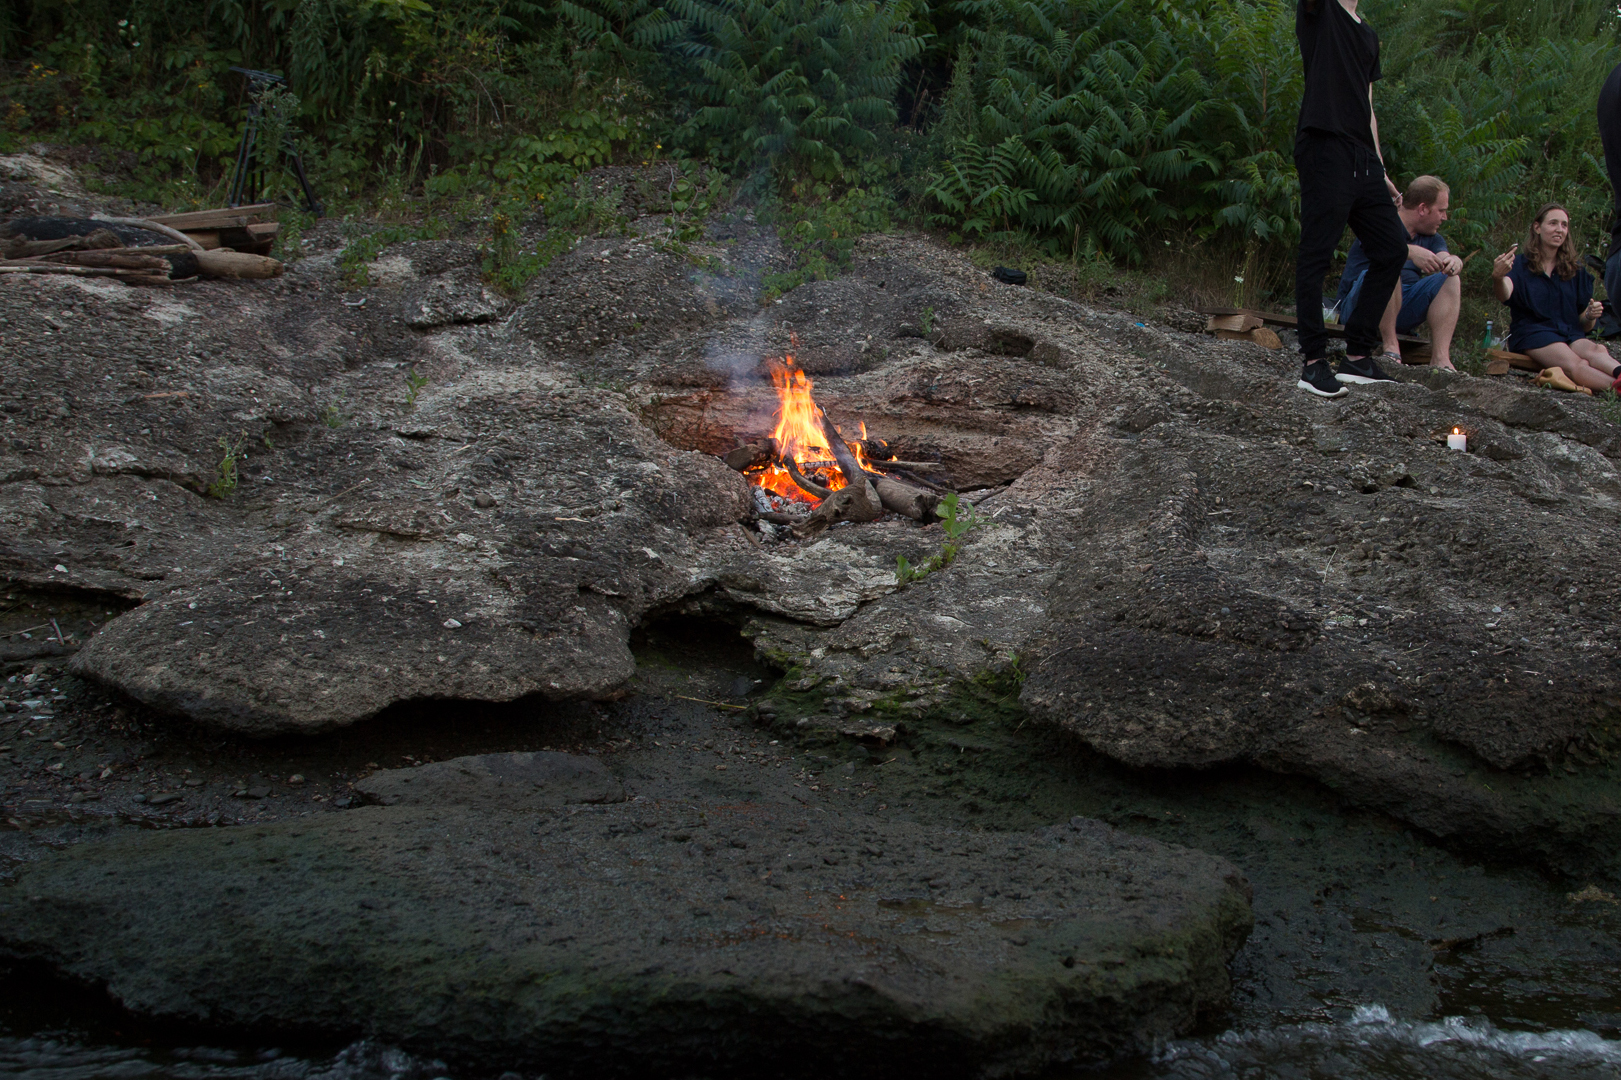 005_Bonfire-34.jpg